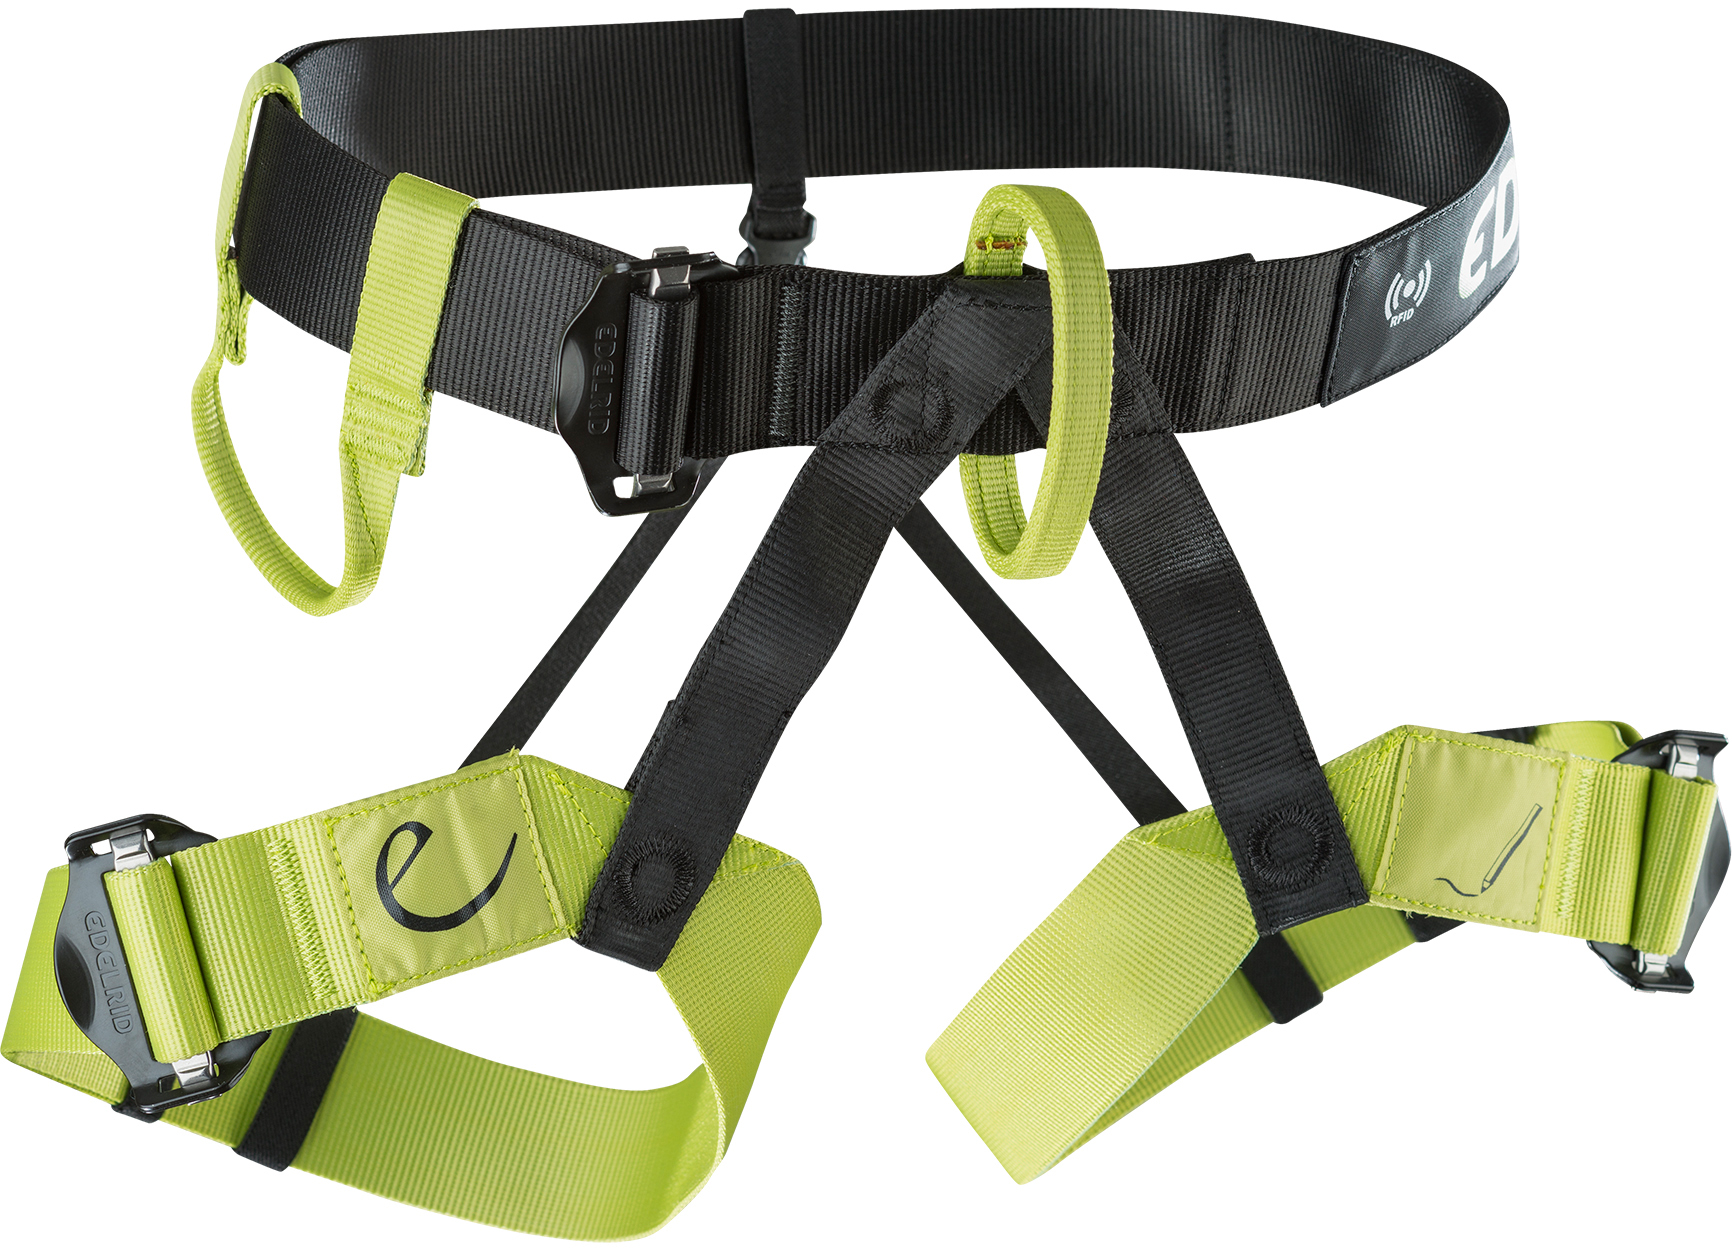 Klettergurt Edelrid Fraggle : Edelrid climbing harnesses